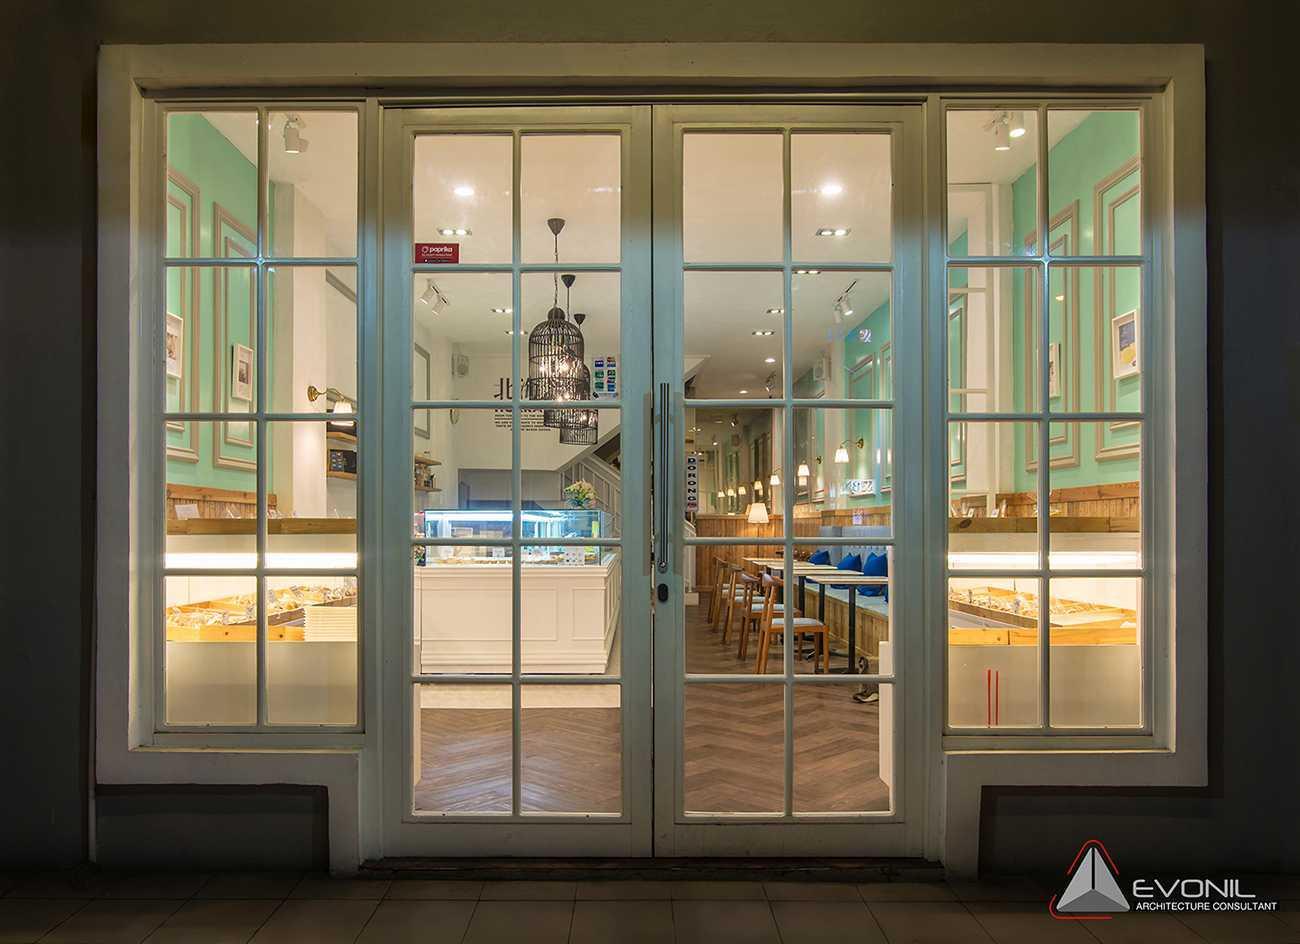 Foto inspirasi ide desain entrance klasik Entrance door oleh Evonil Architecture di Arsitag